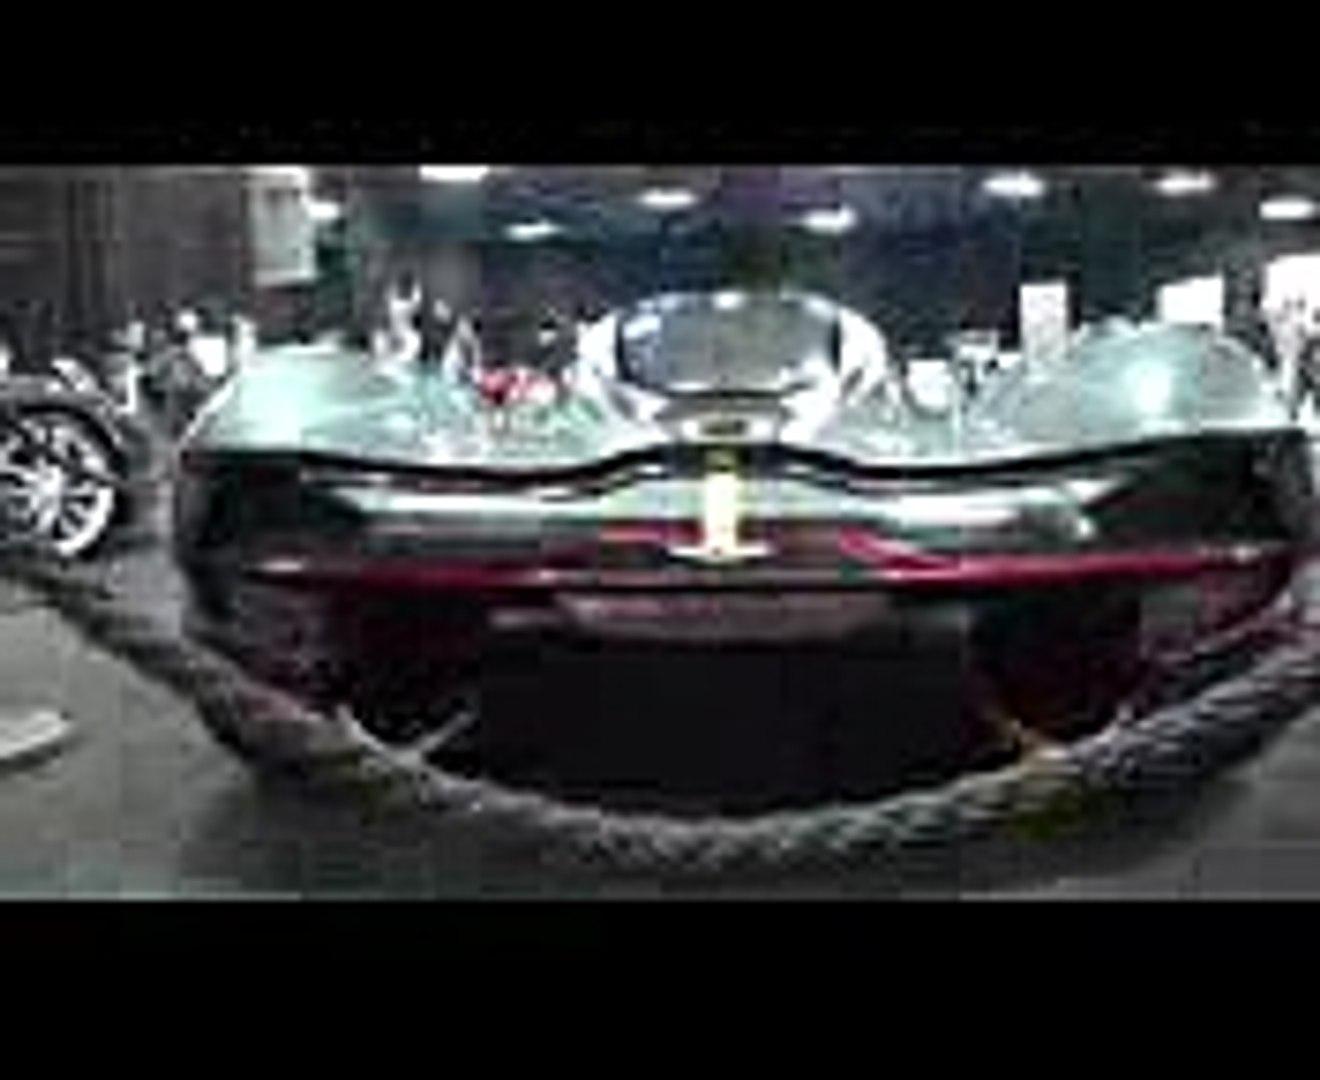 The 2018 Aston Martin Valkyrie!!